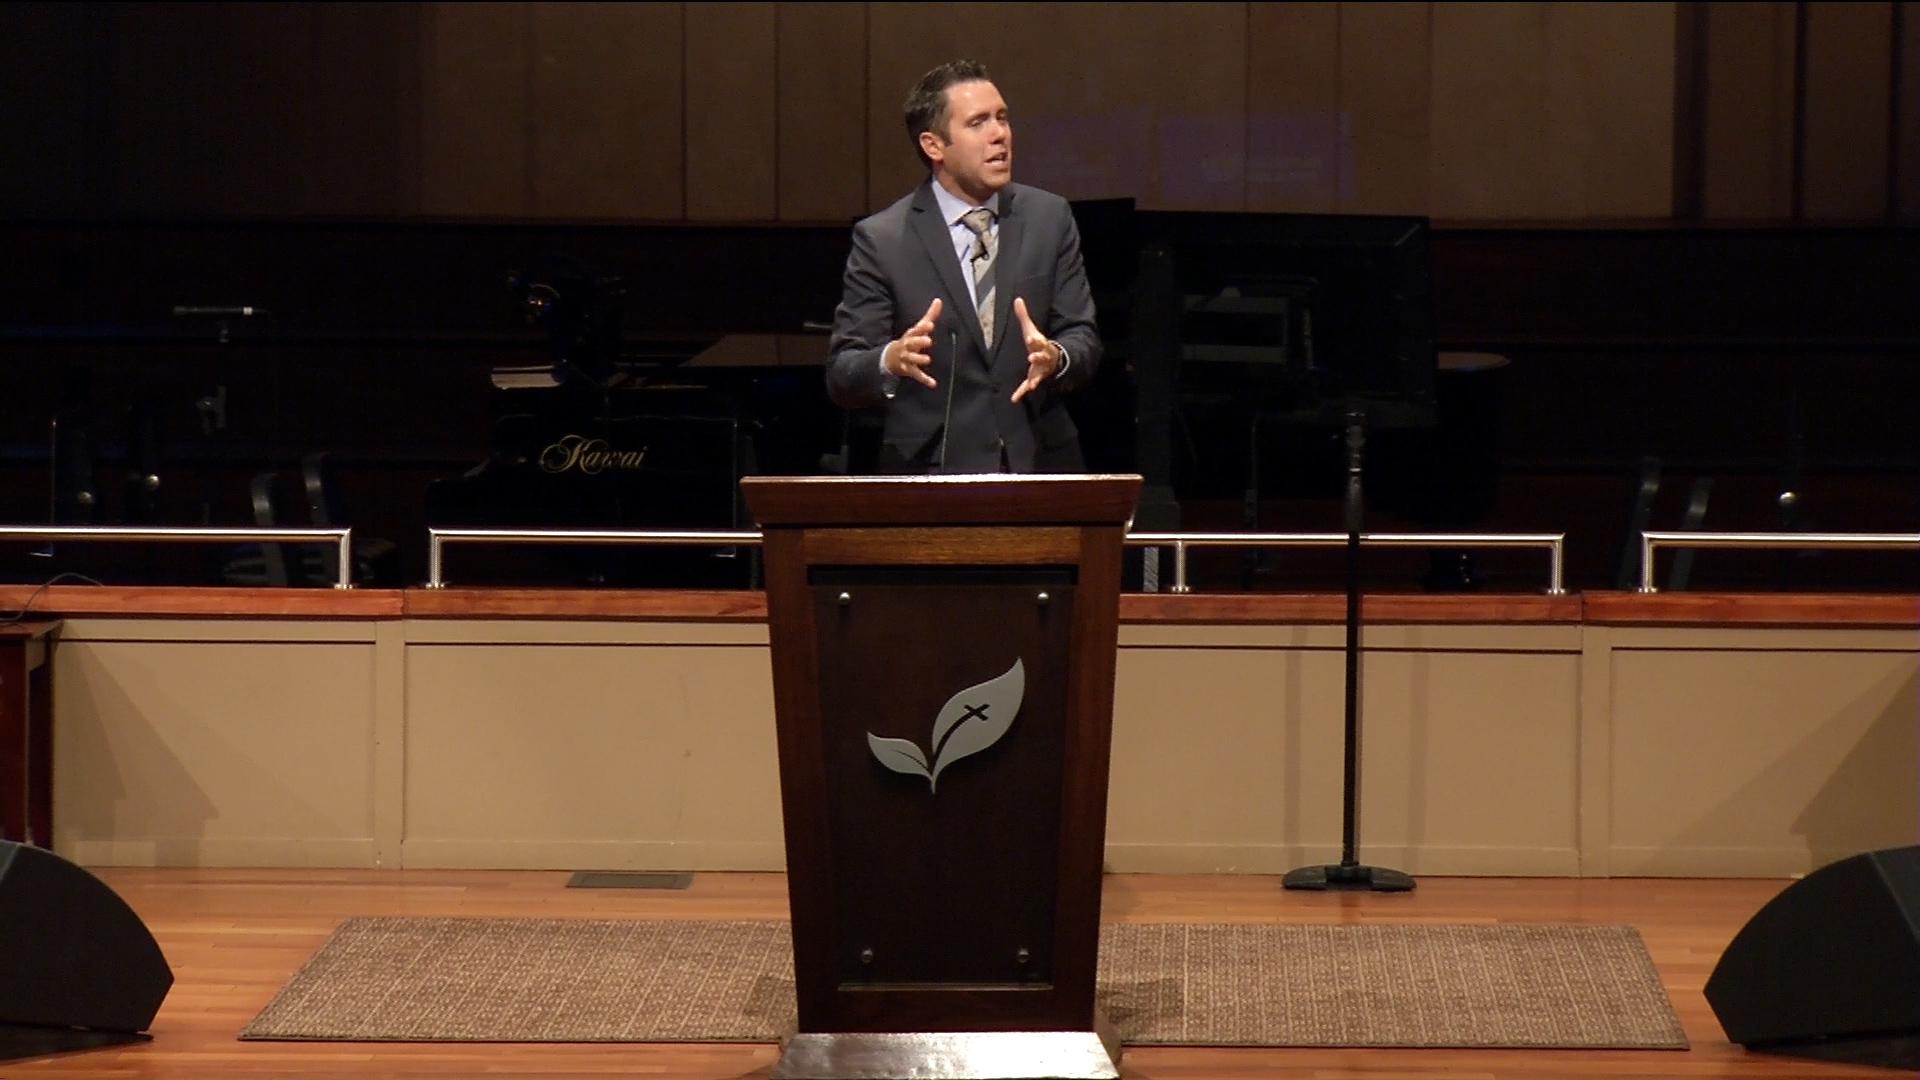 Thomas Shepherd: The Christian's Heart